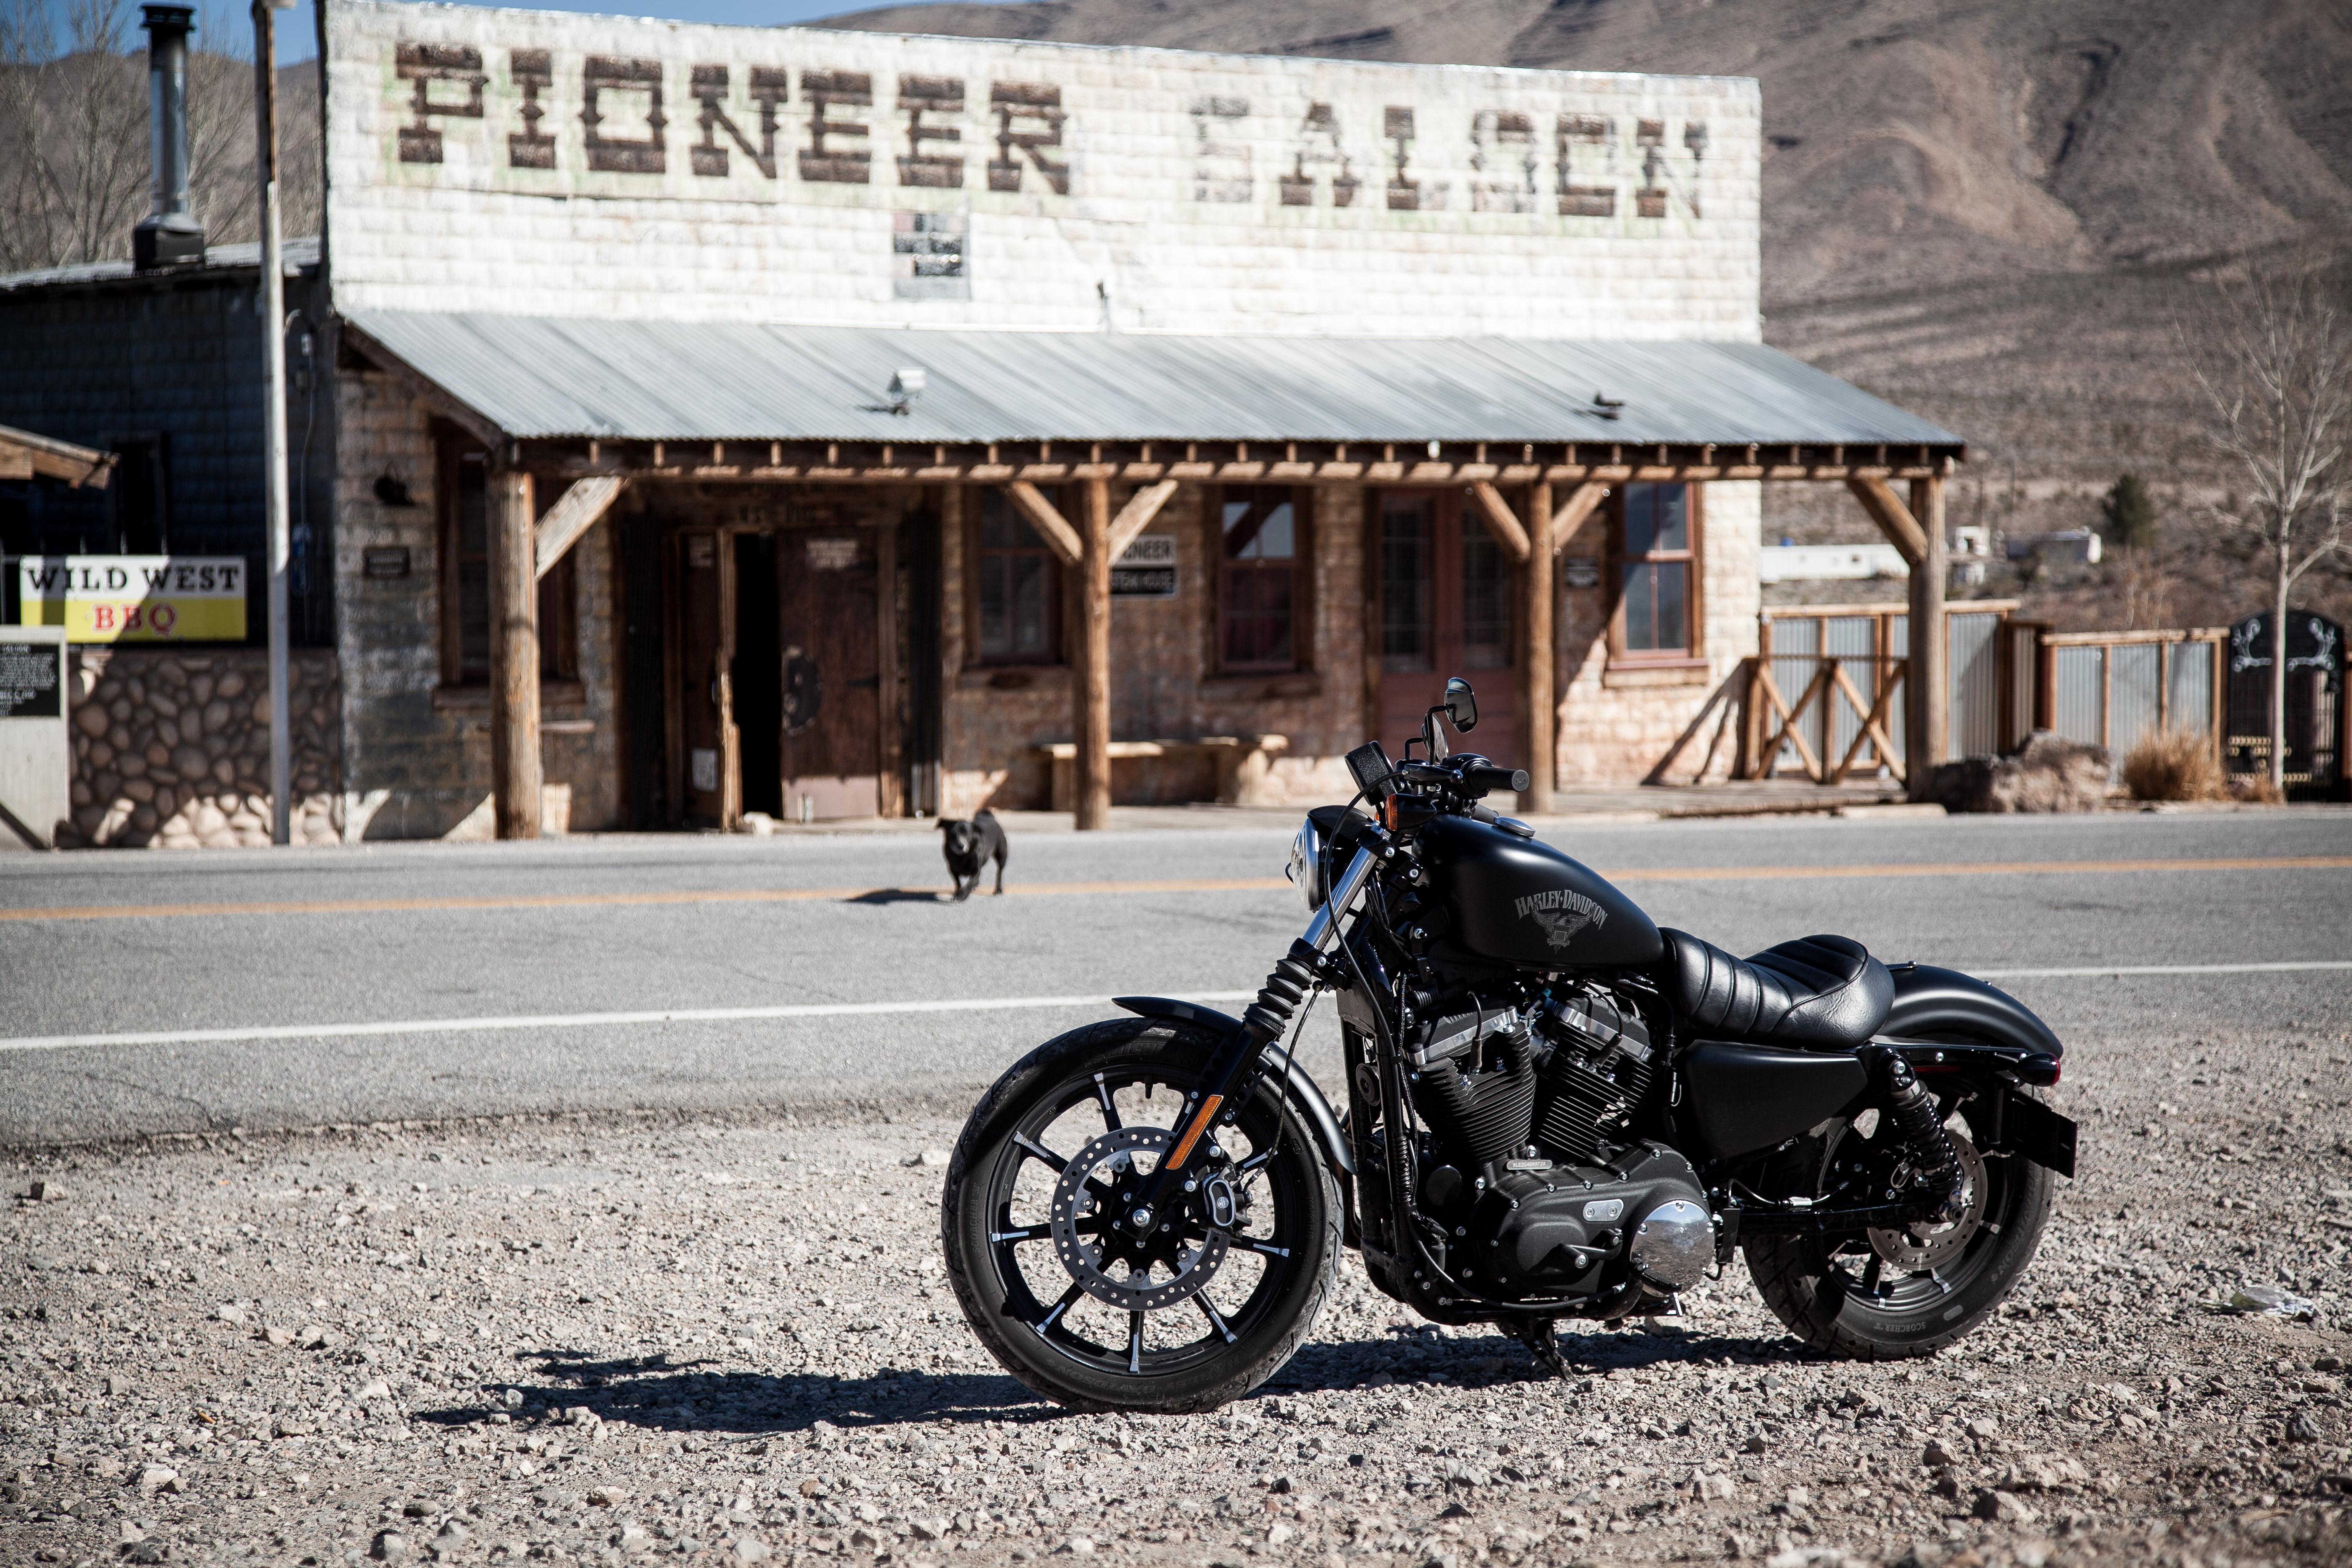 2016 Harley Davidson Sportster Iron 883 Review Revzilla Start Switch Wiring Triumph Forum Rat Motorcycle Forums